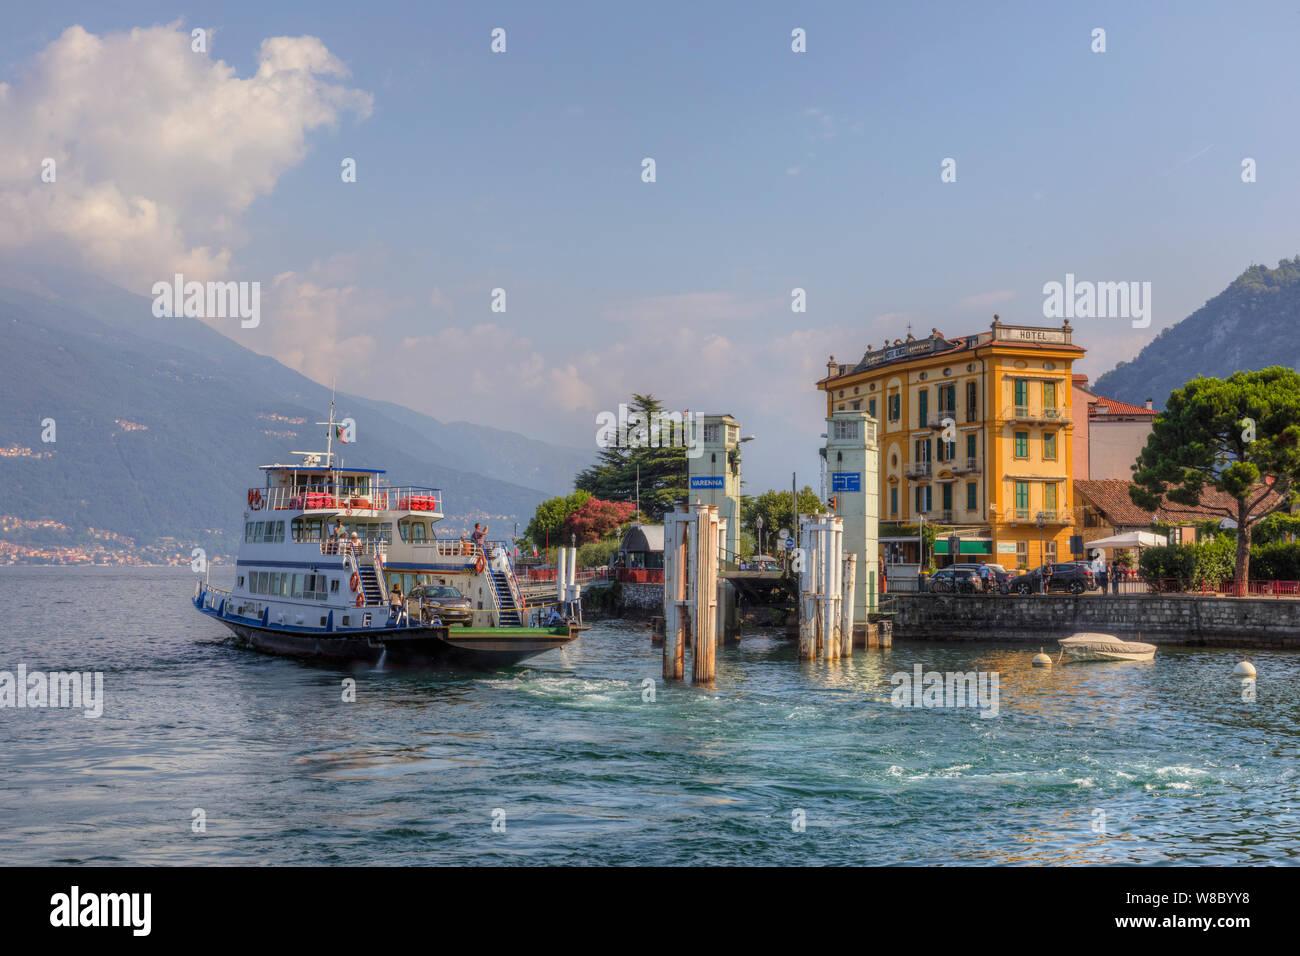 Varenna, Lake Como, Lombardy, Italy, Europe Stock Photo